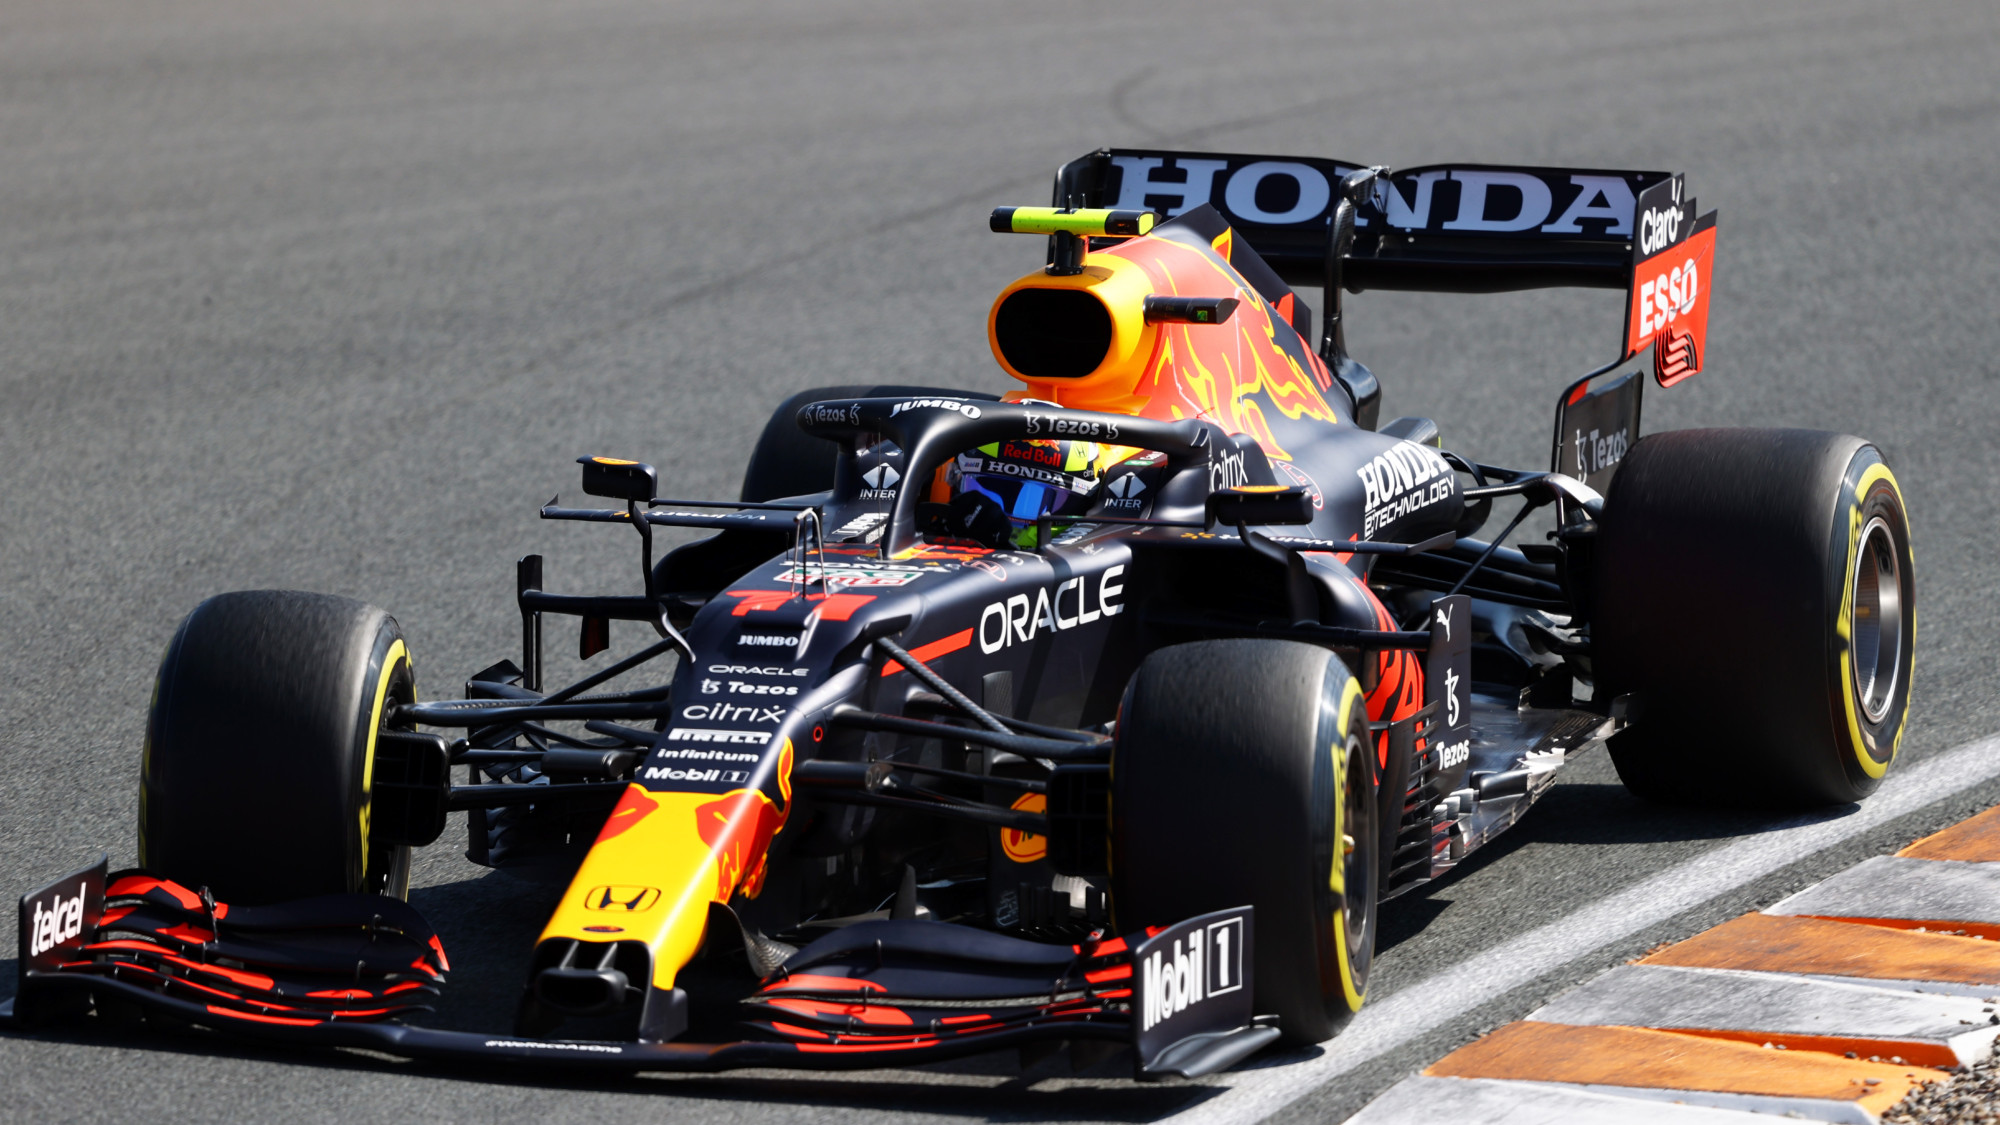 Sergio Perez, 2021 Dutch GP